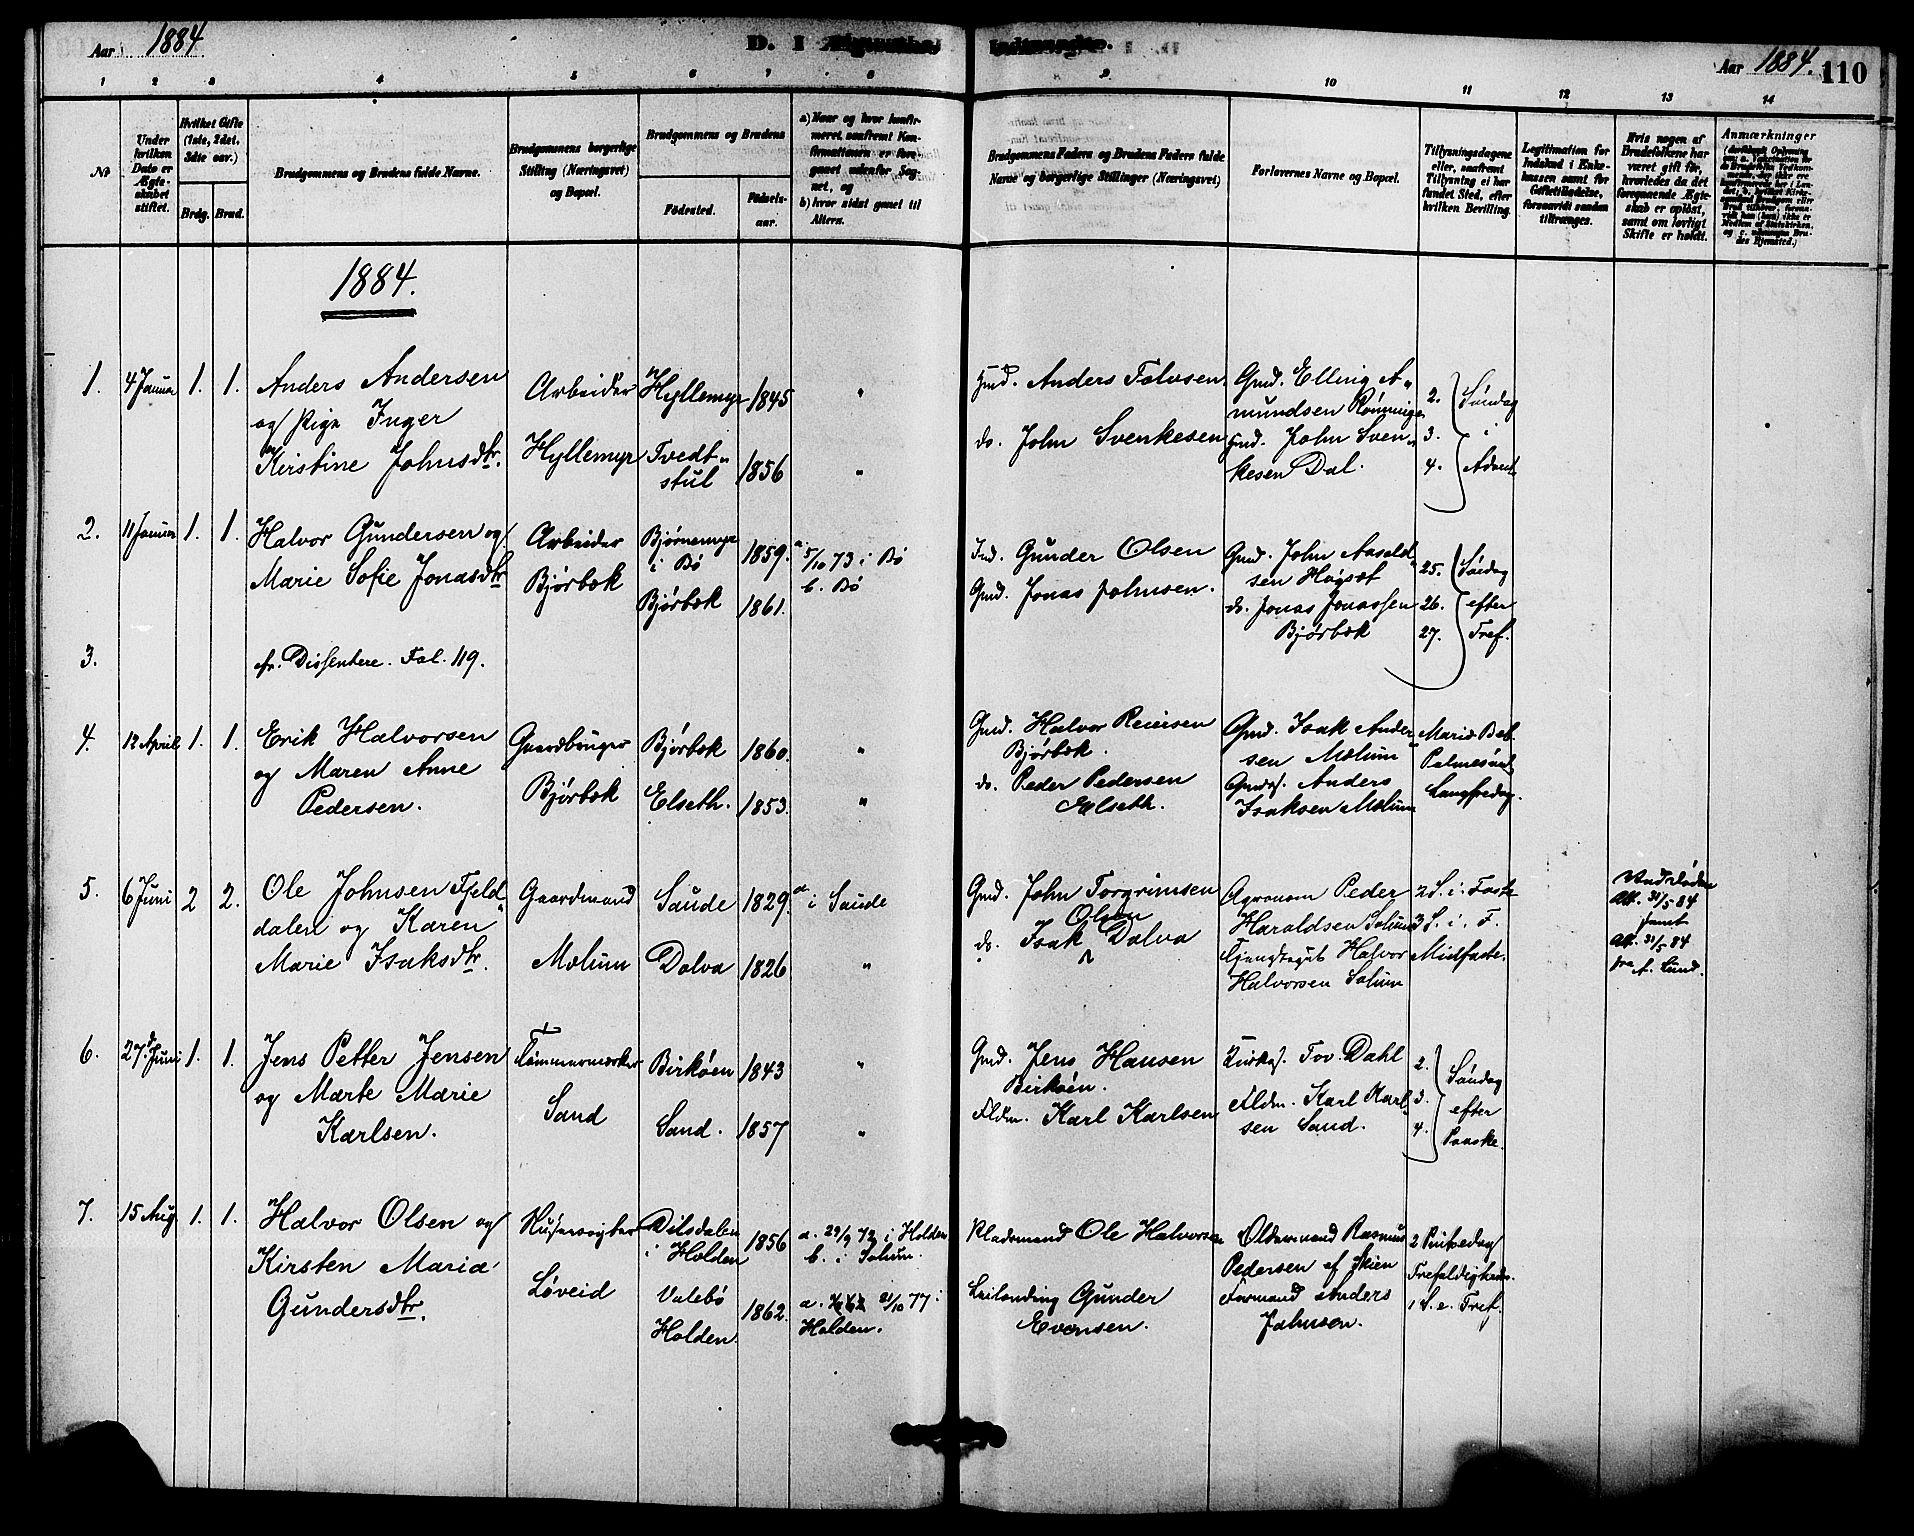 SAKO, Solum kirkebøker, F/Fb/L0001: Ministerialbok nr. II 1, 1877-1892, s. 110